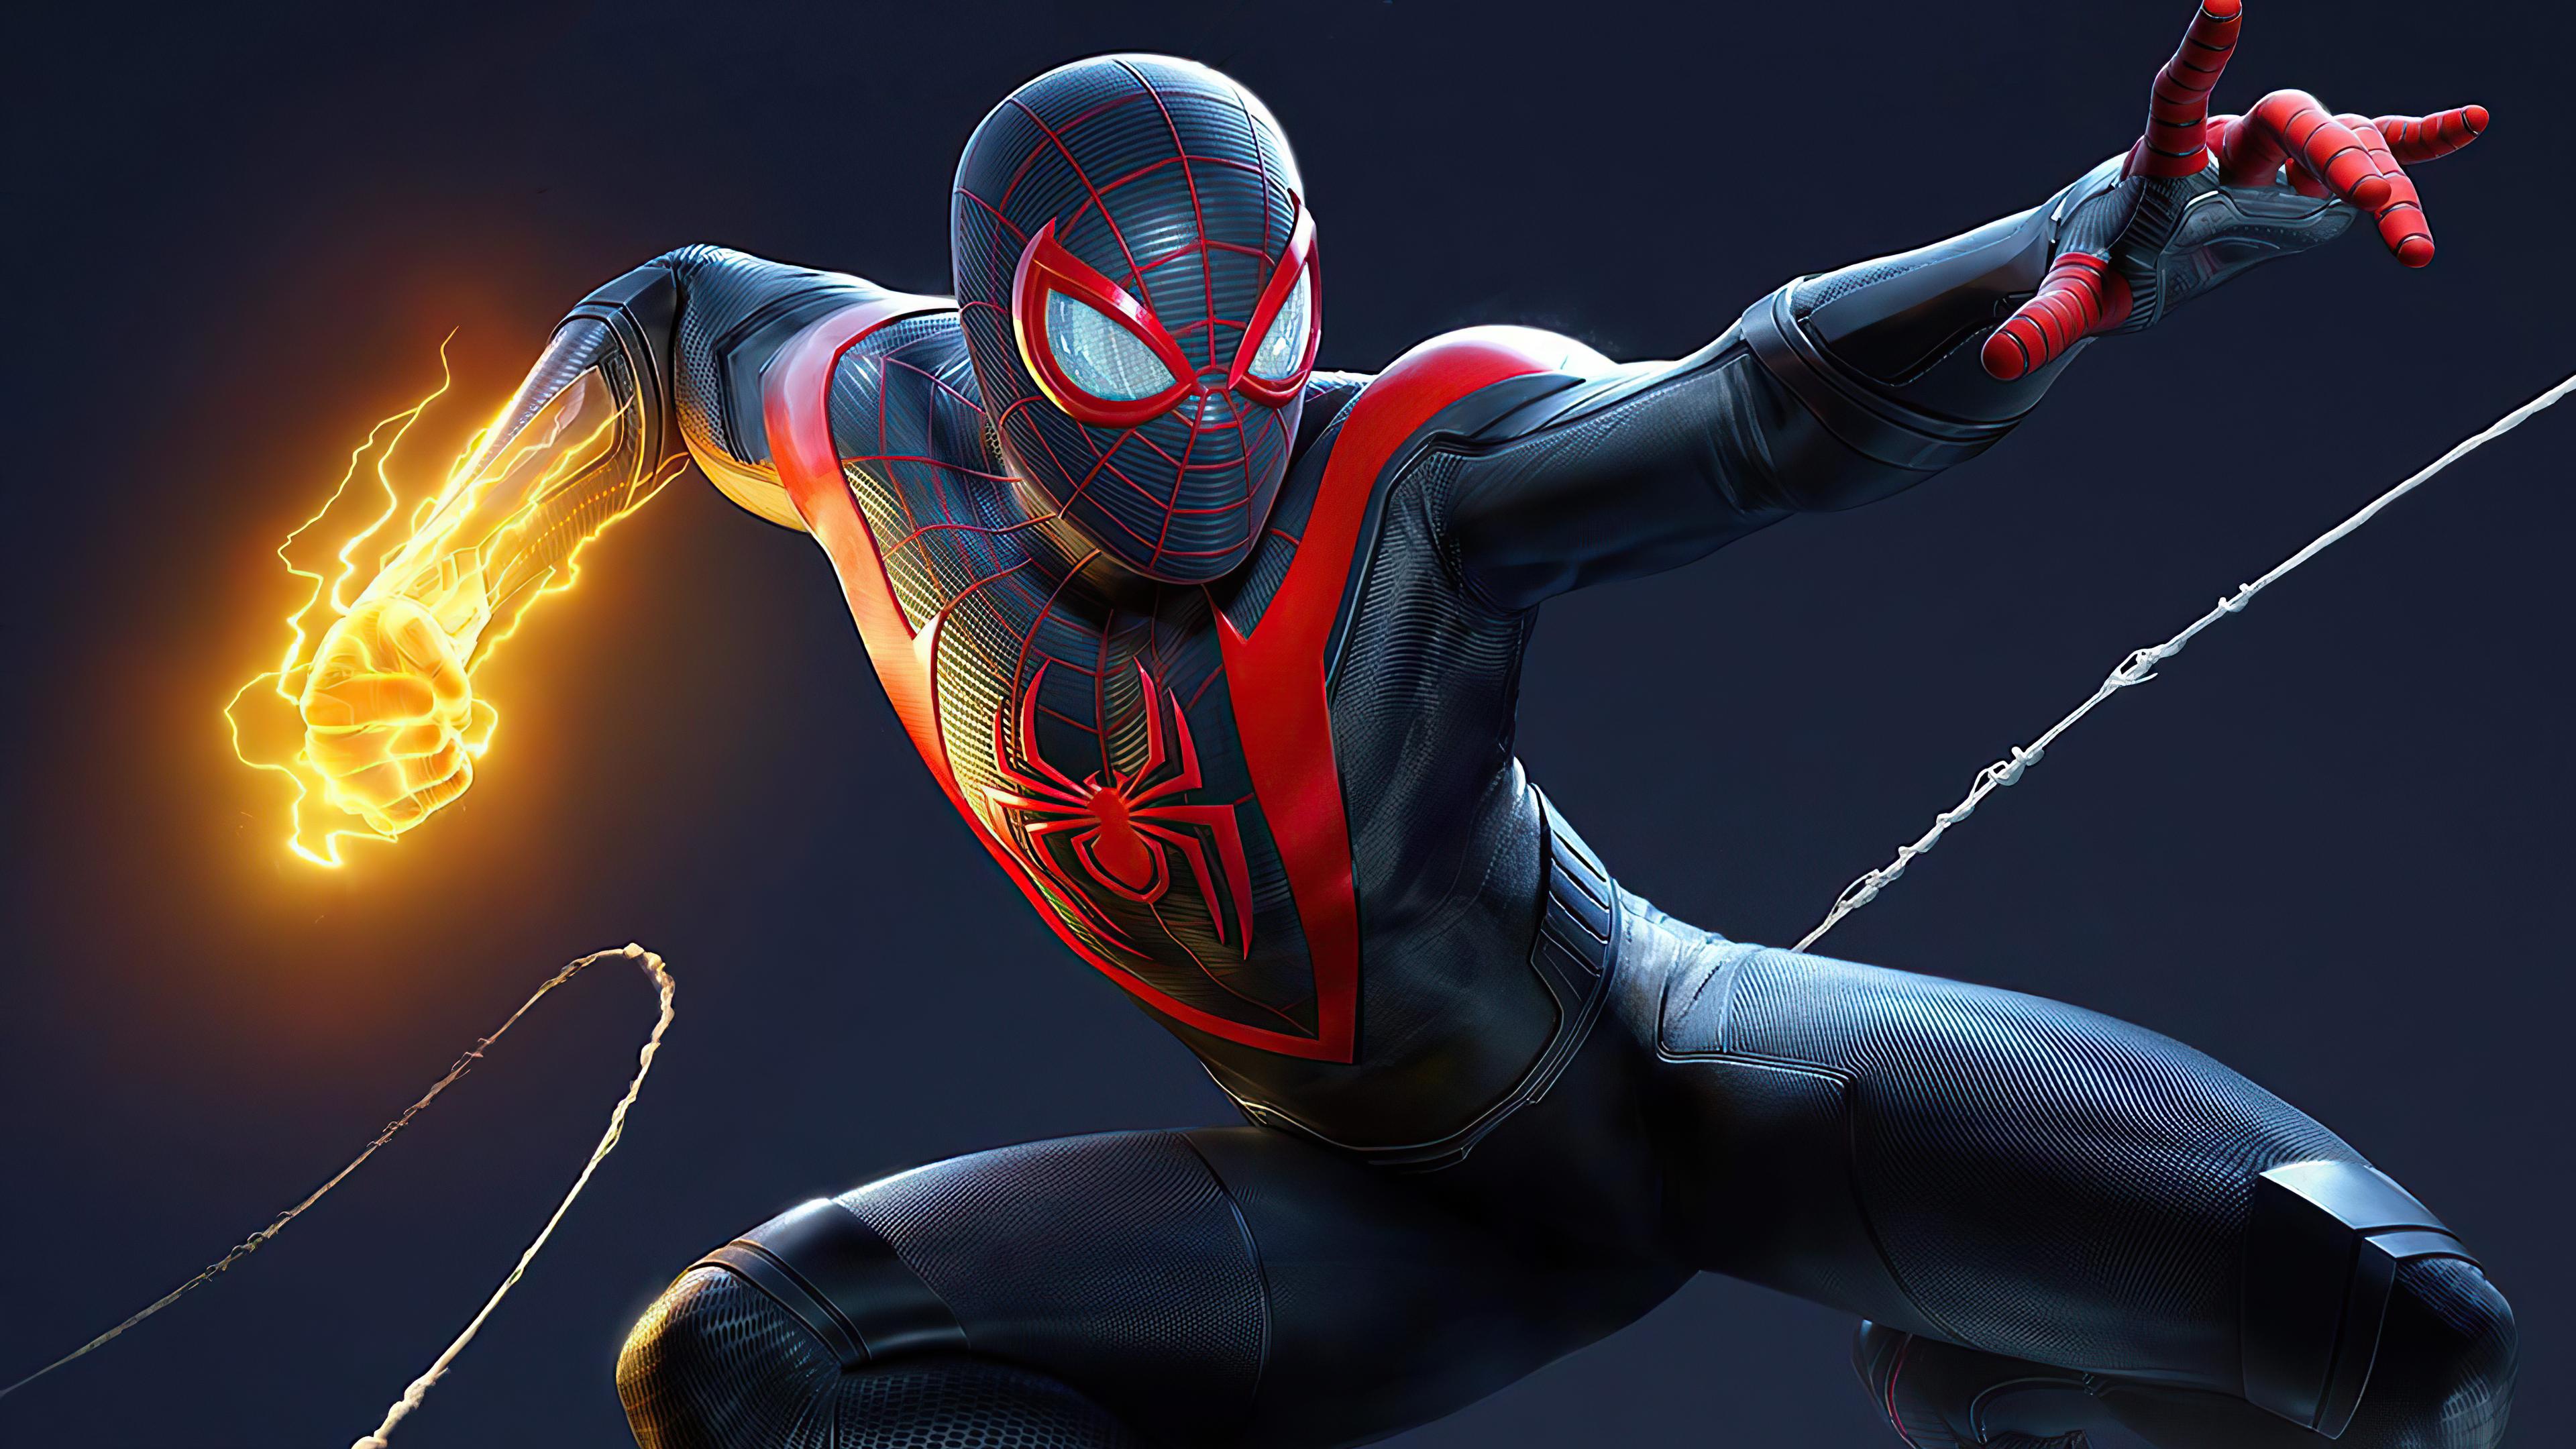 marvel-spider-man-miles-morales-iz.jpg